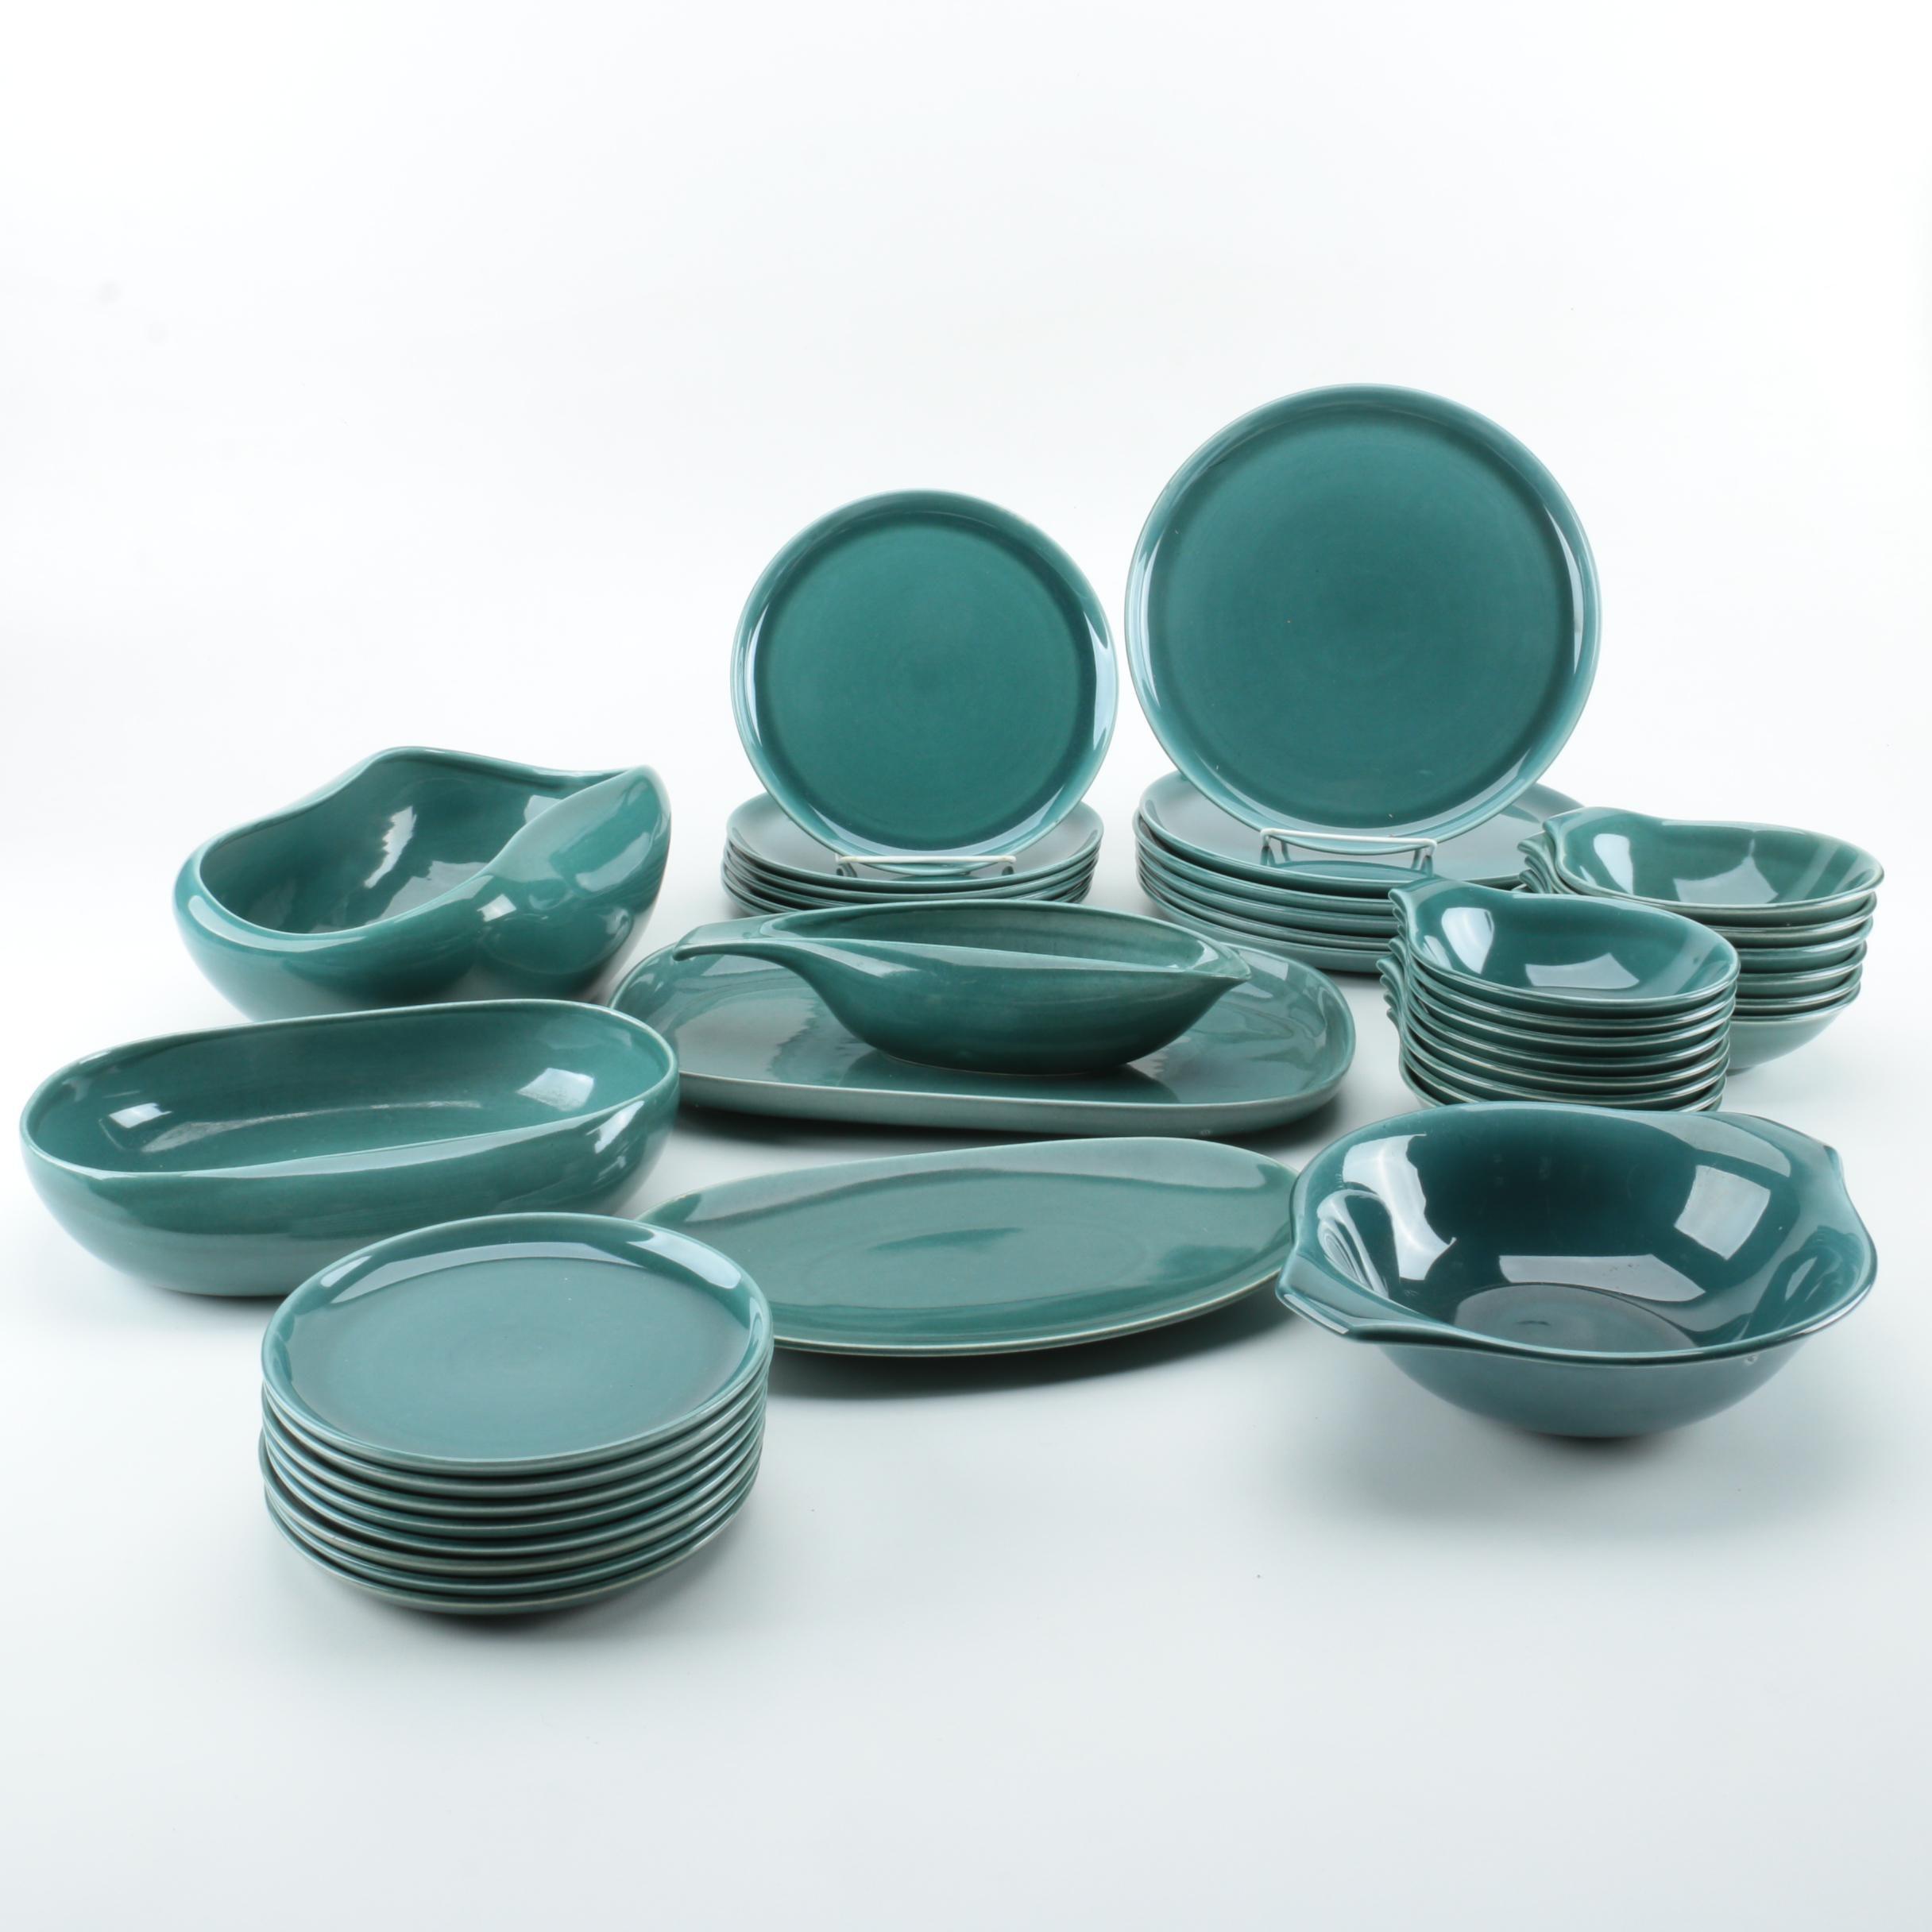 "Steubenville ""American Modern Seafoam Green"" Russel Wright Tableware"